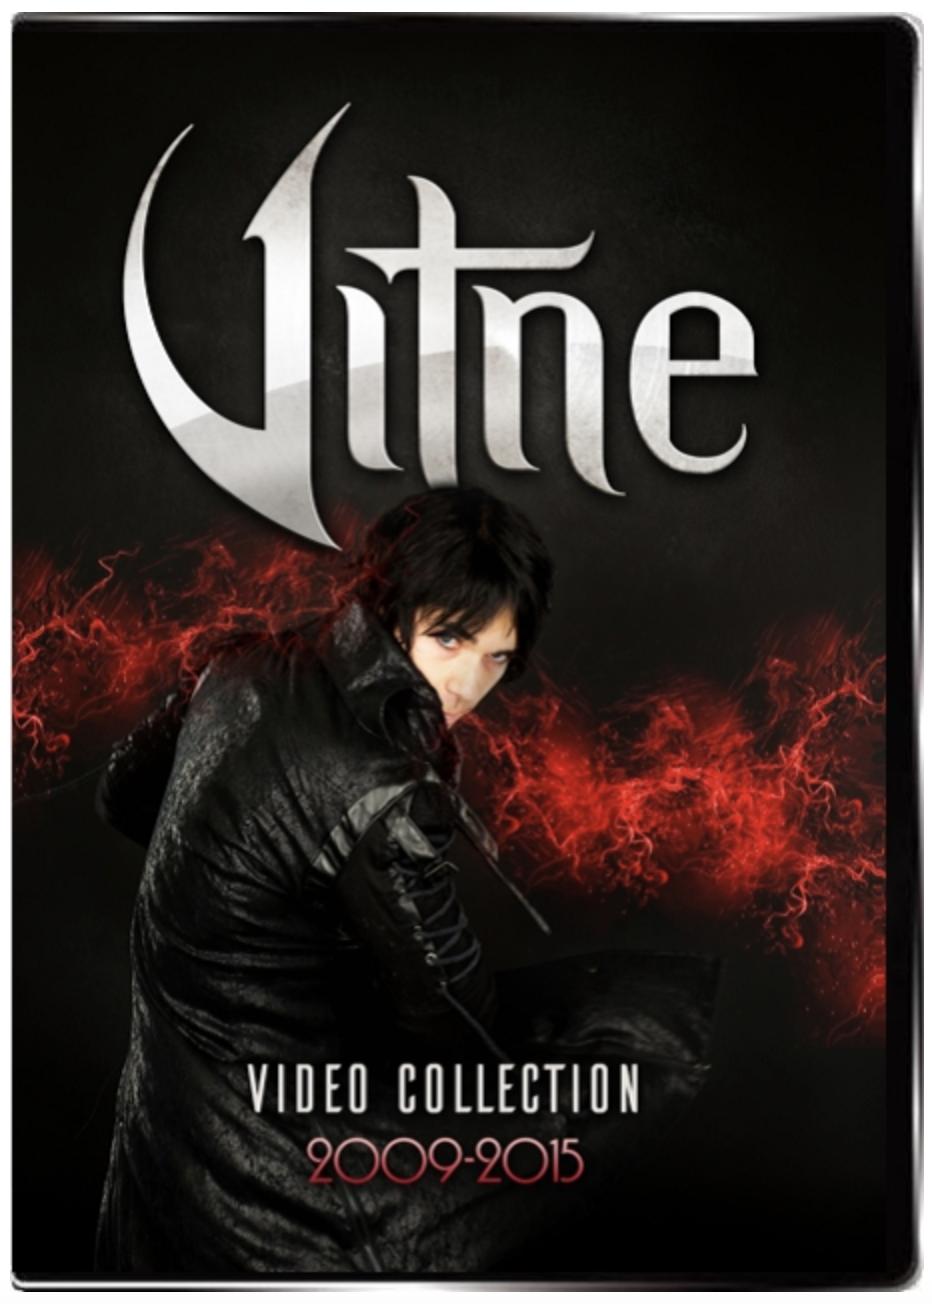 VITNE Video Collection DVD